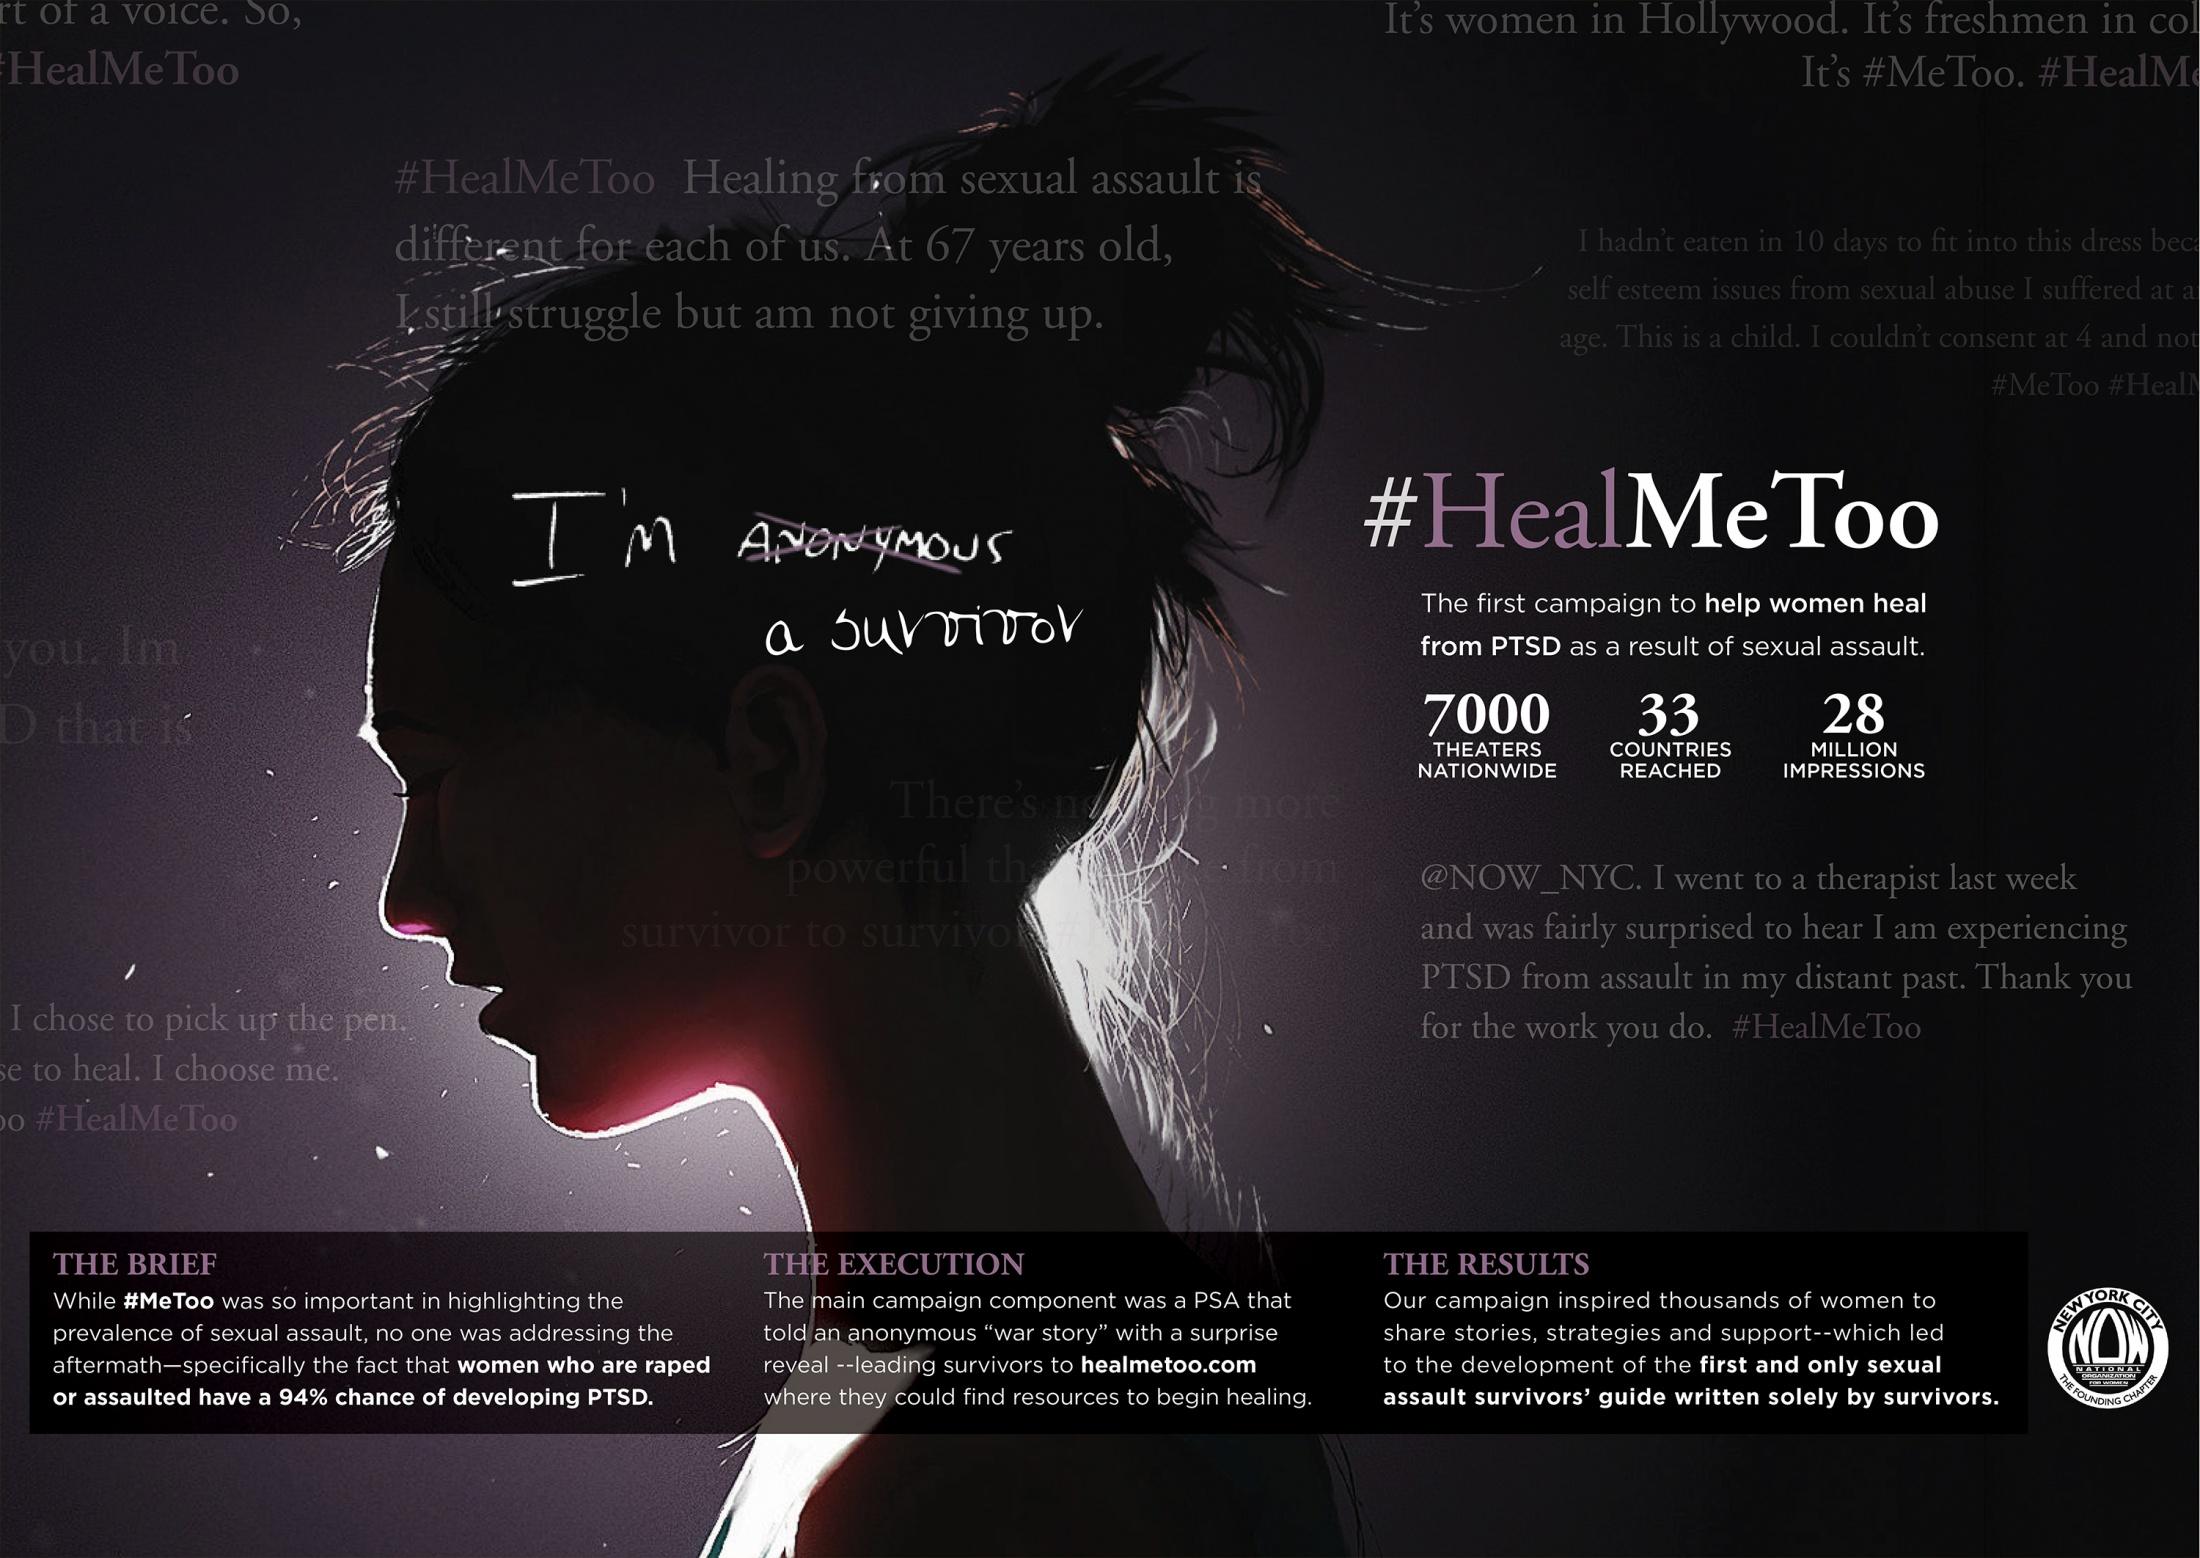 Thumbnail for #Healmetoo